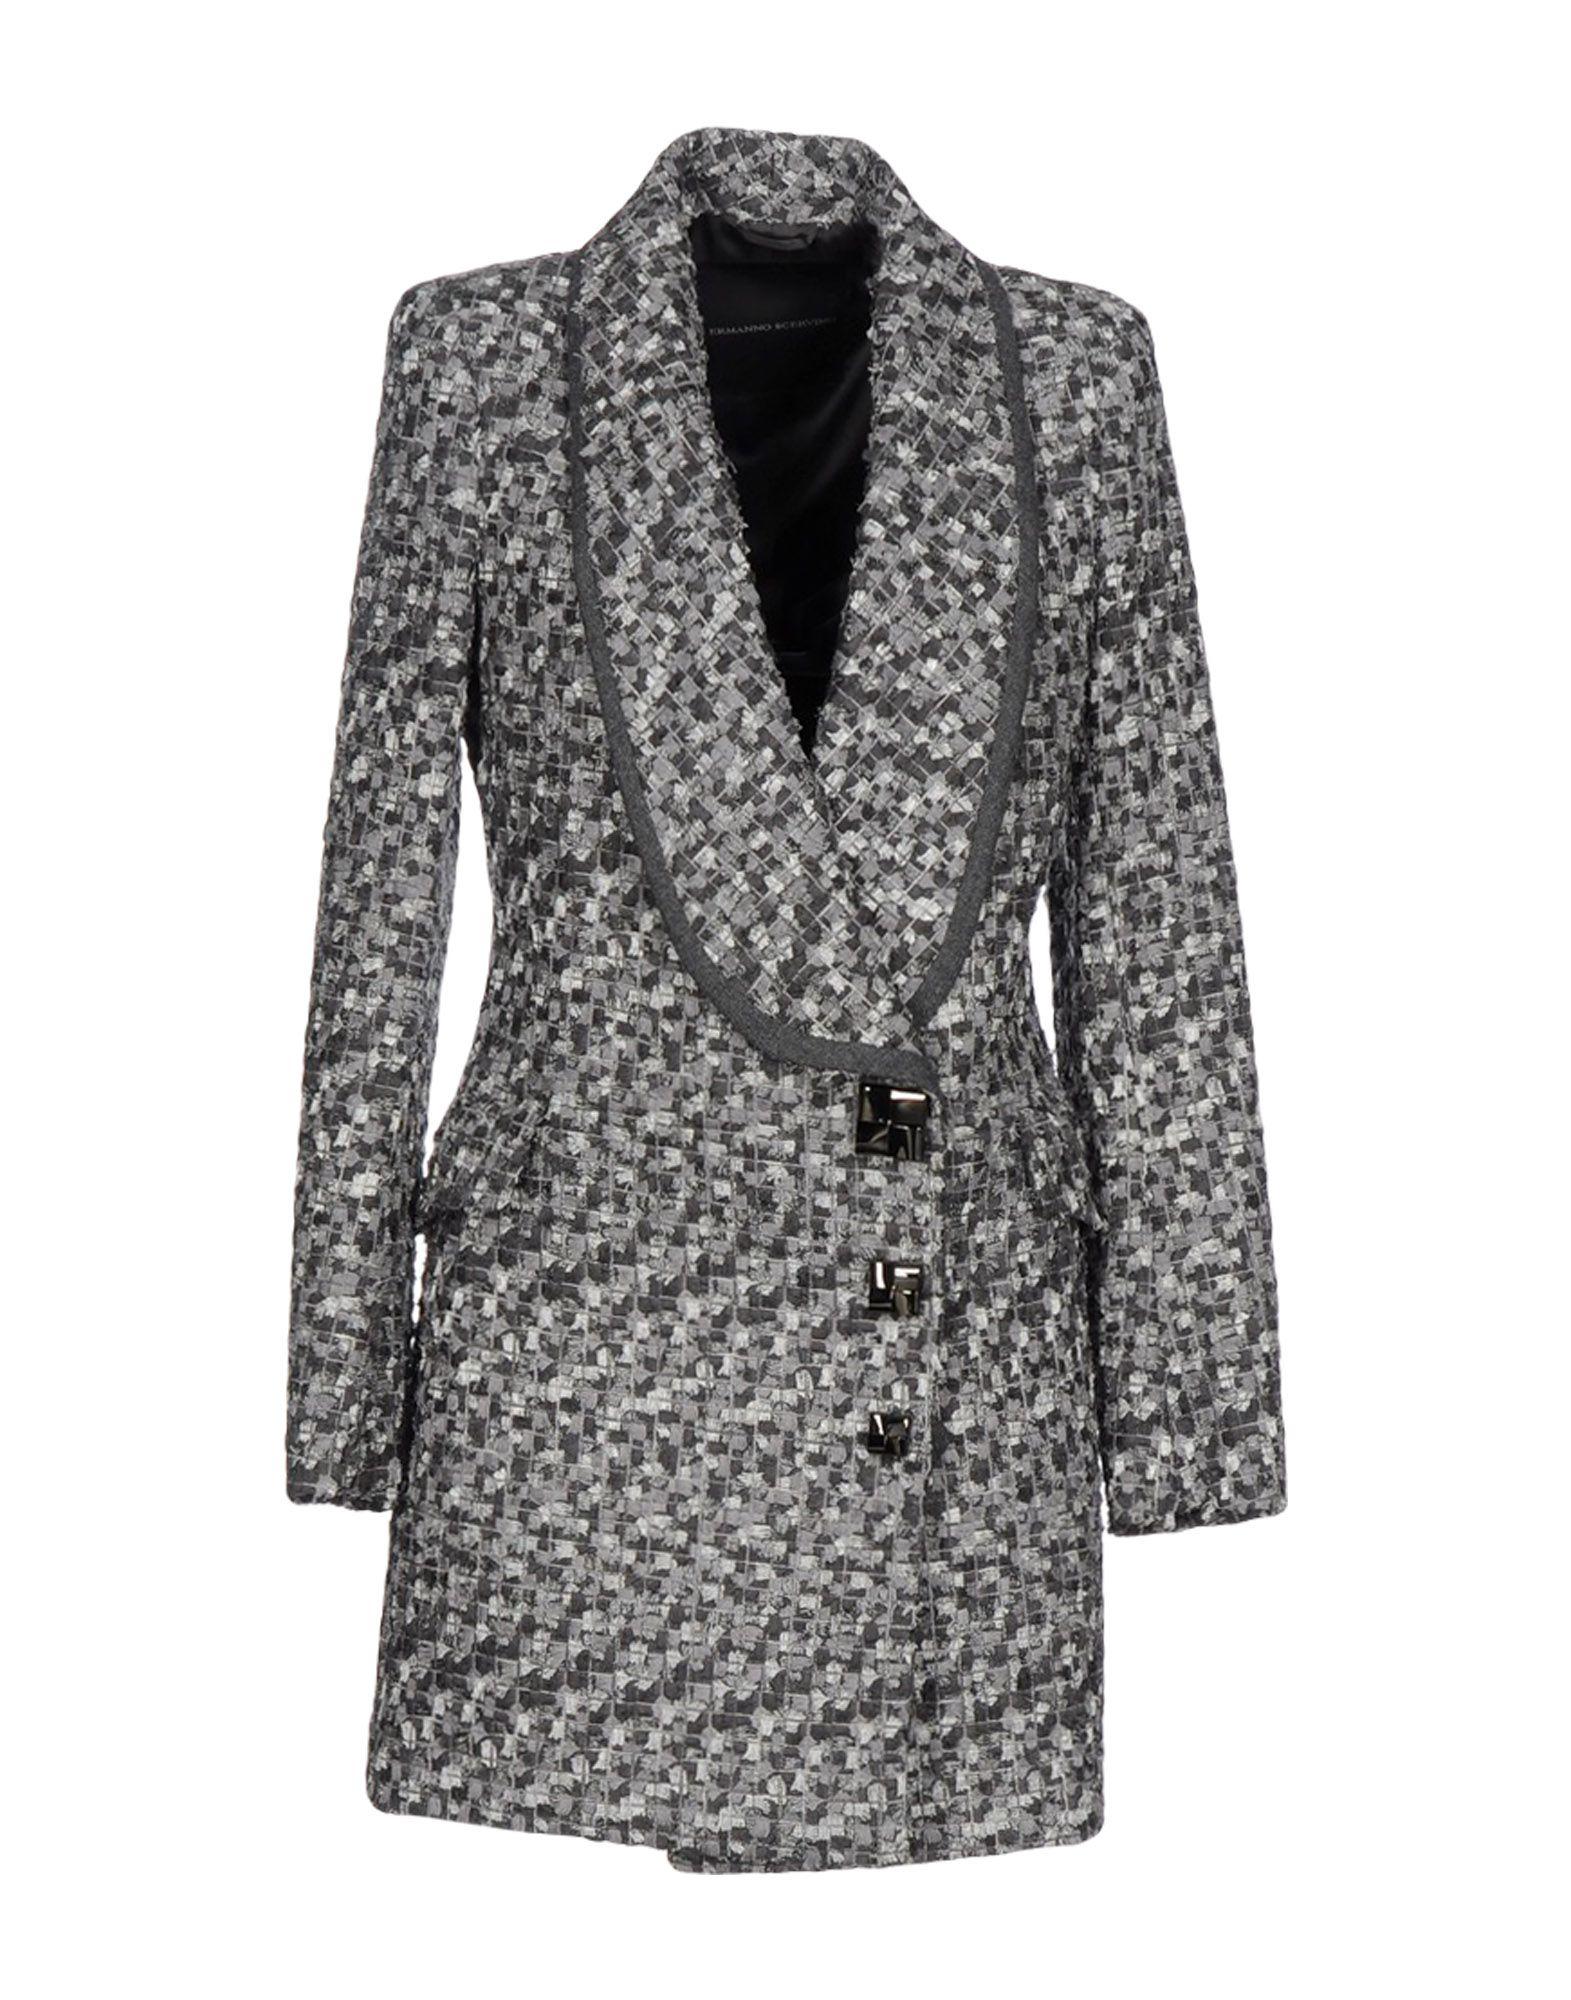 ERMANNO SCERVINO Damen Mantel Farbe Grau Größe 5 - broschei